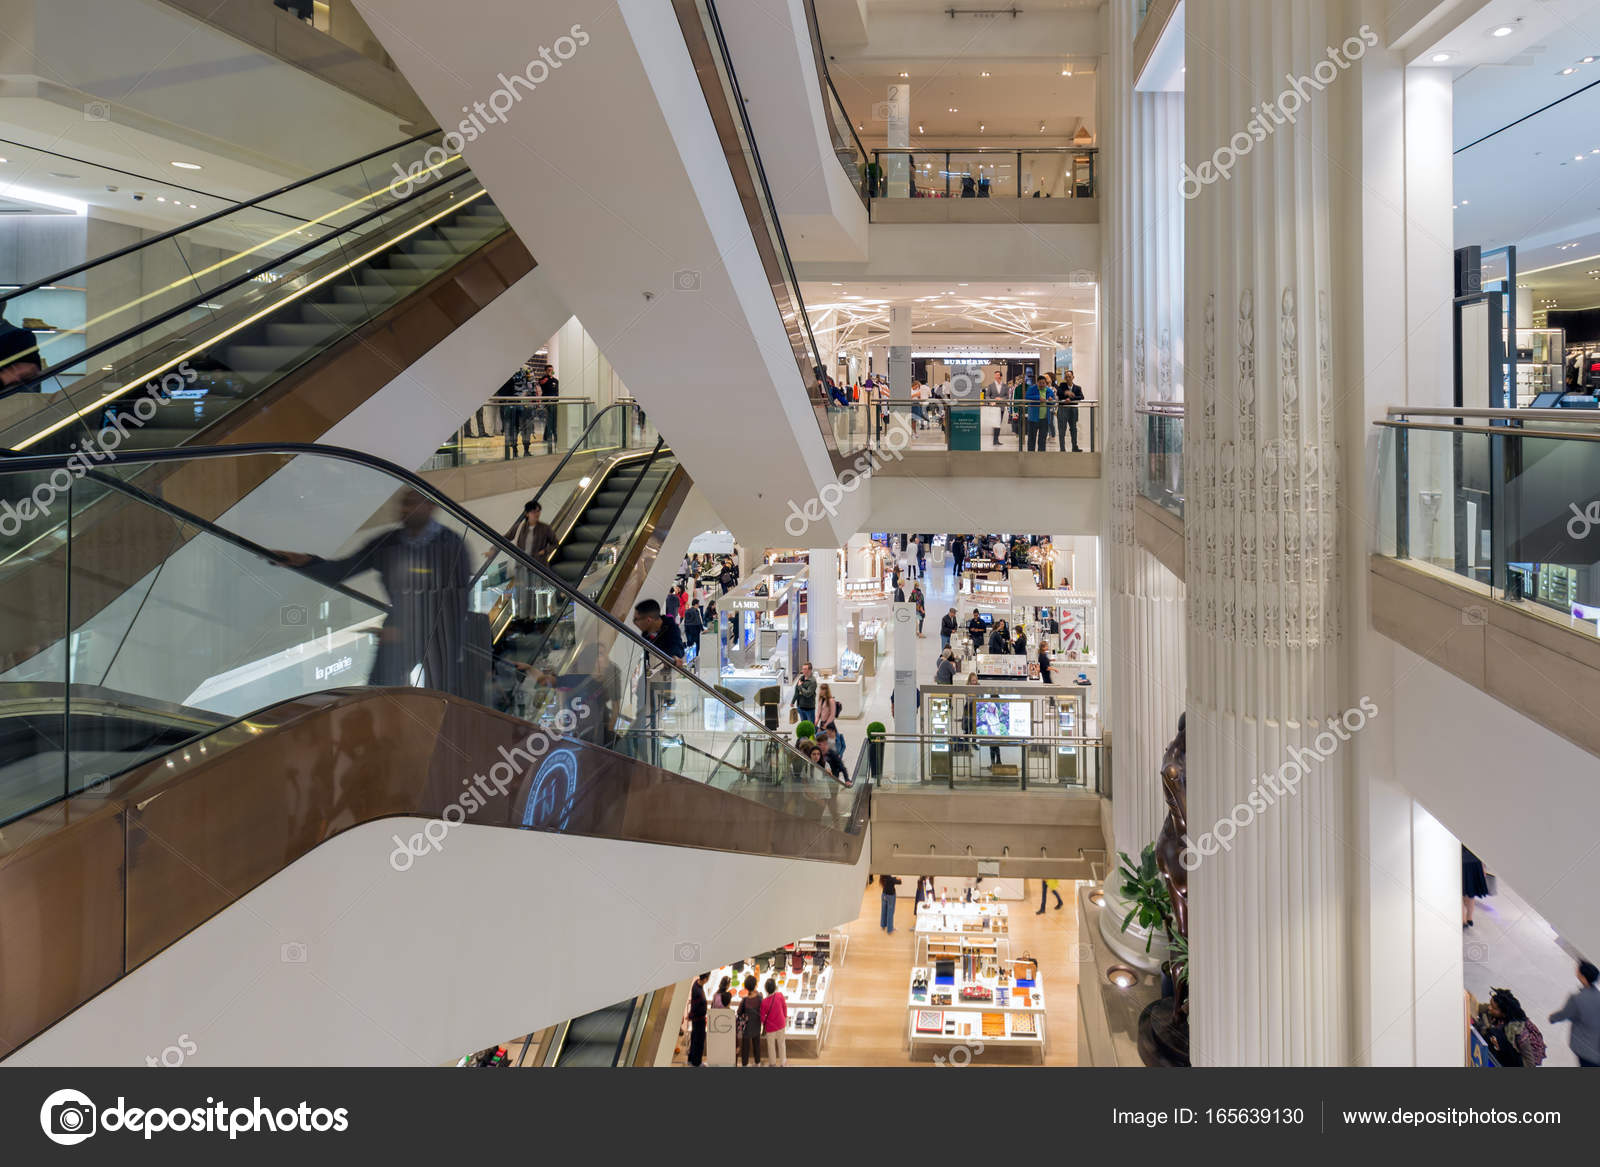 1a18cf70130 셀 프리 지 스 백화점 Lo 사람들 쇼핑 계단 – 스톡 에디토리얼 사진 ...